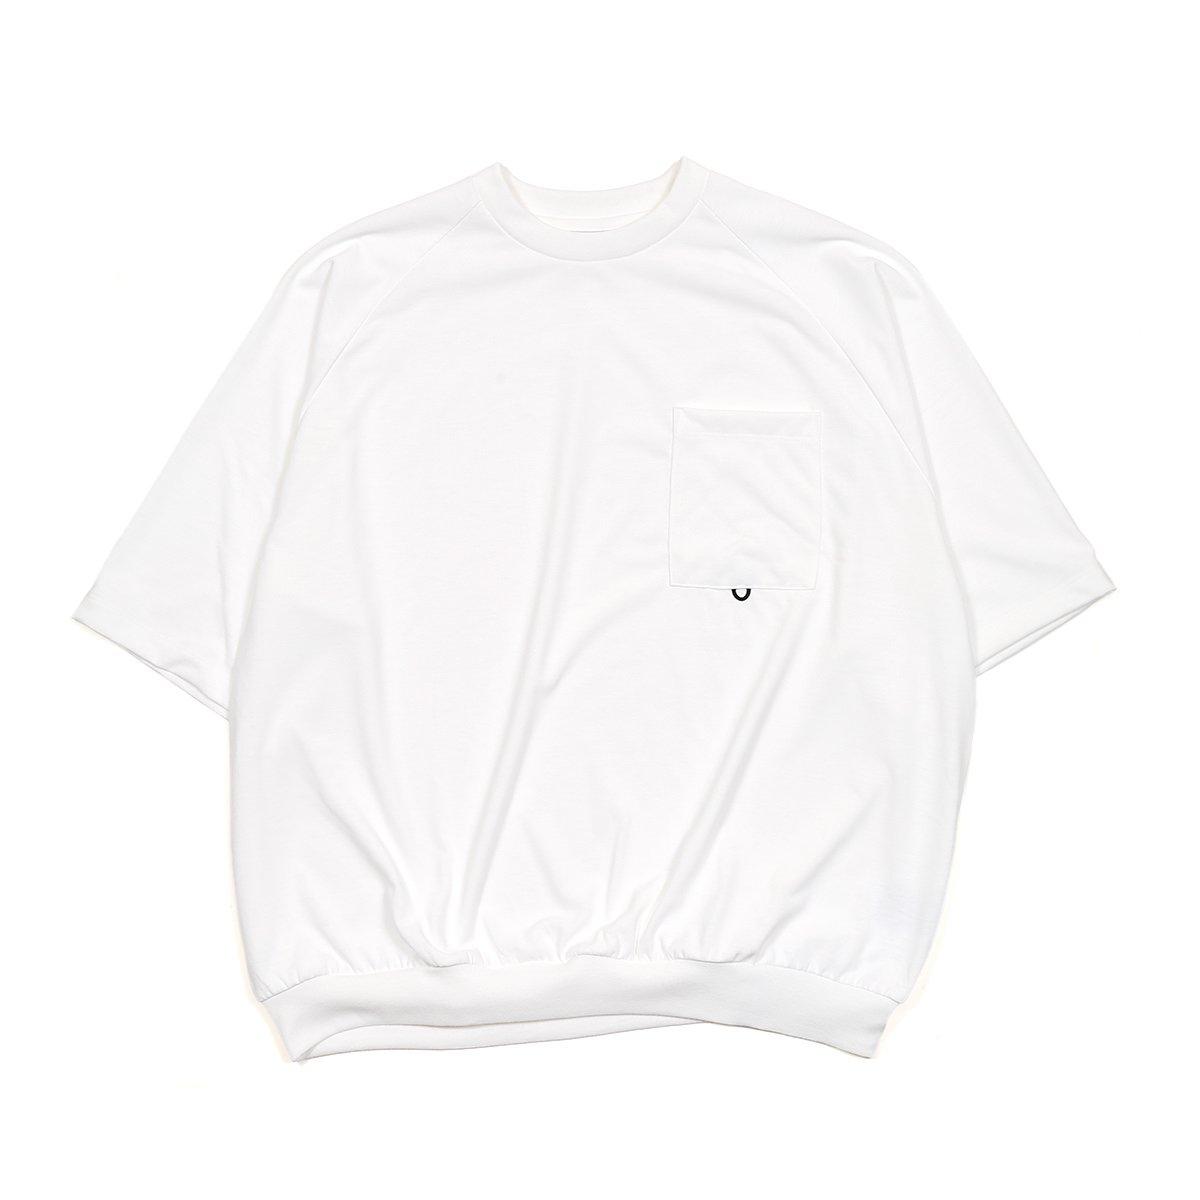 Short Sleeve RIB T-shirts 詳細画像14